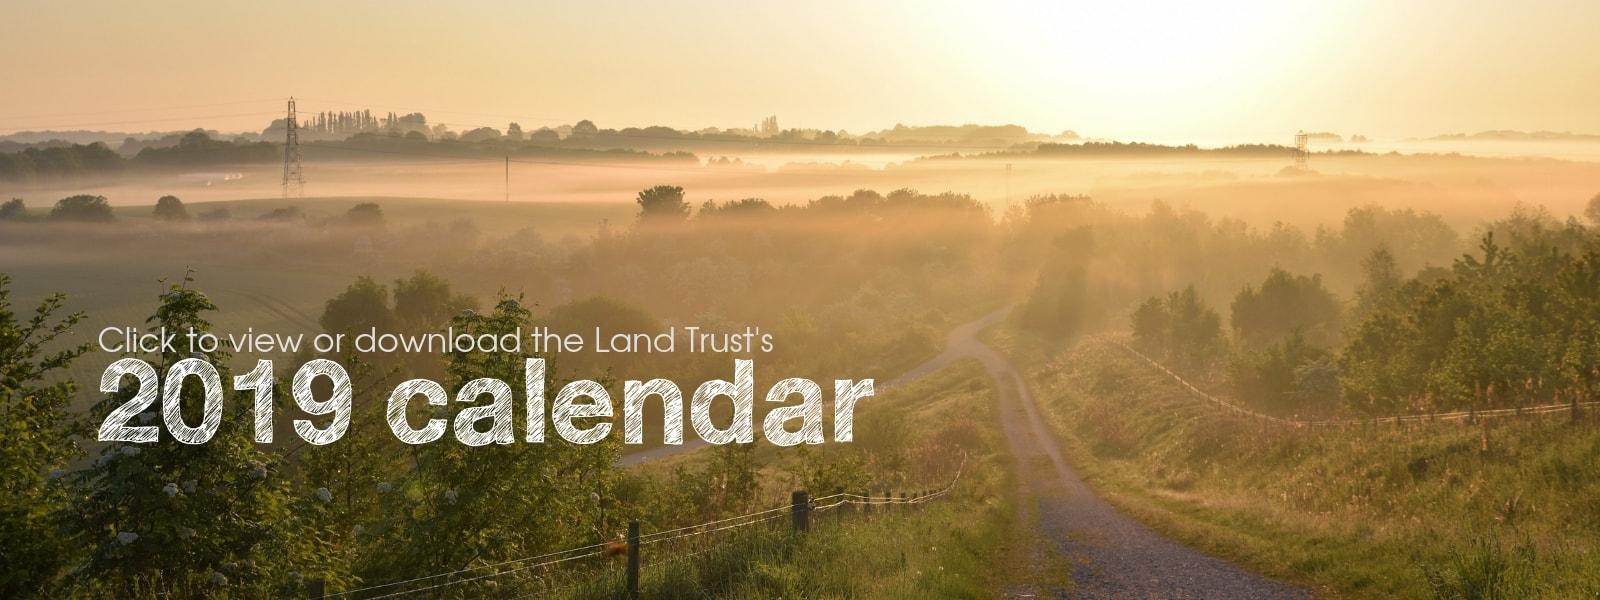 Land Trust calendar